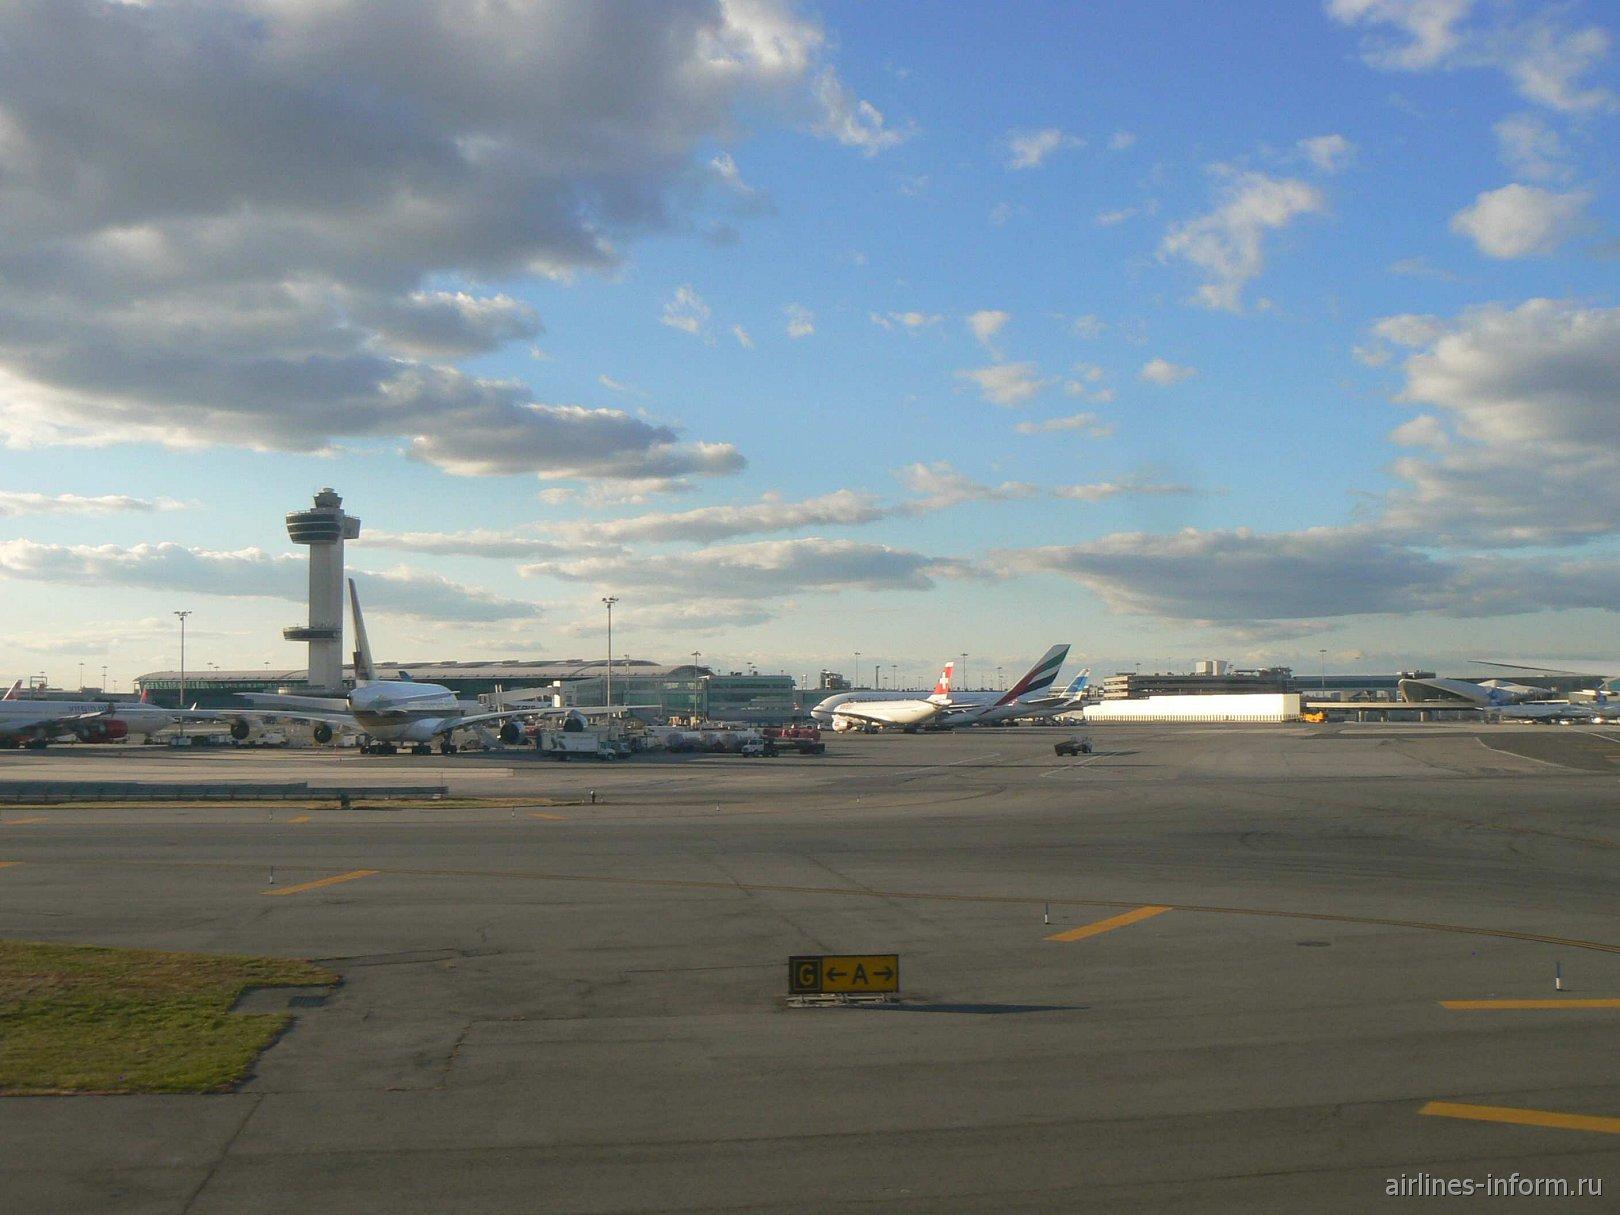 Терминал 4 аэропорта Нью-Йорк Джон Кеннеди